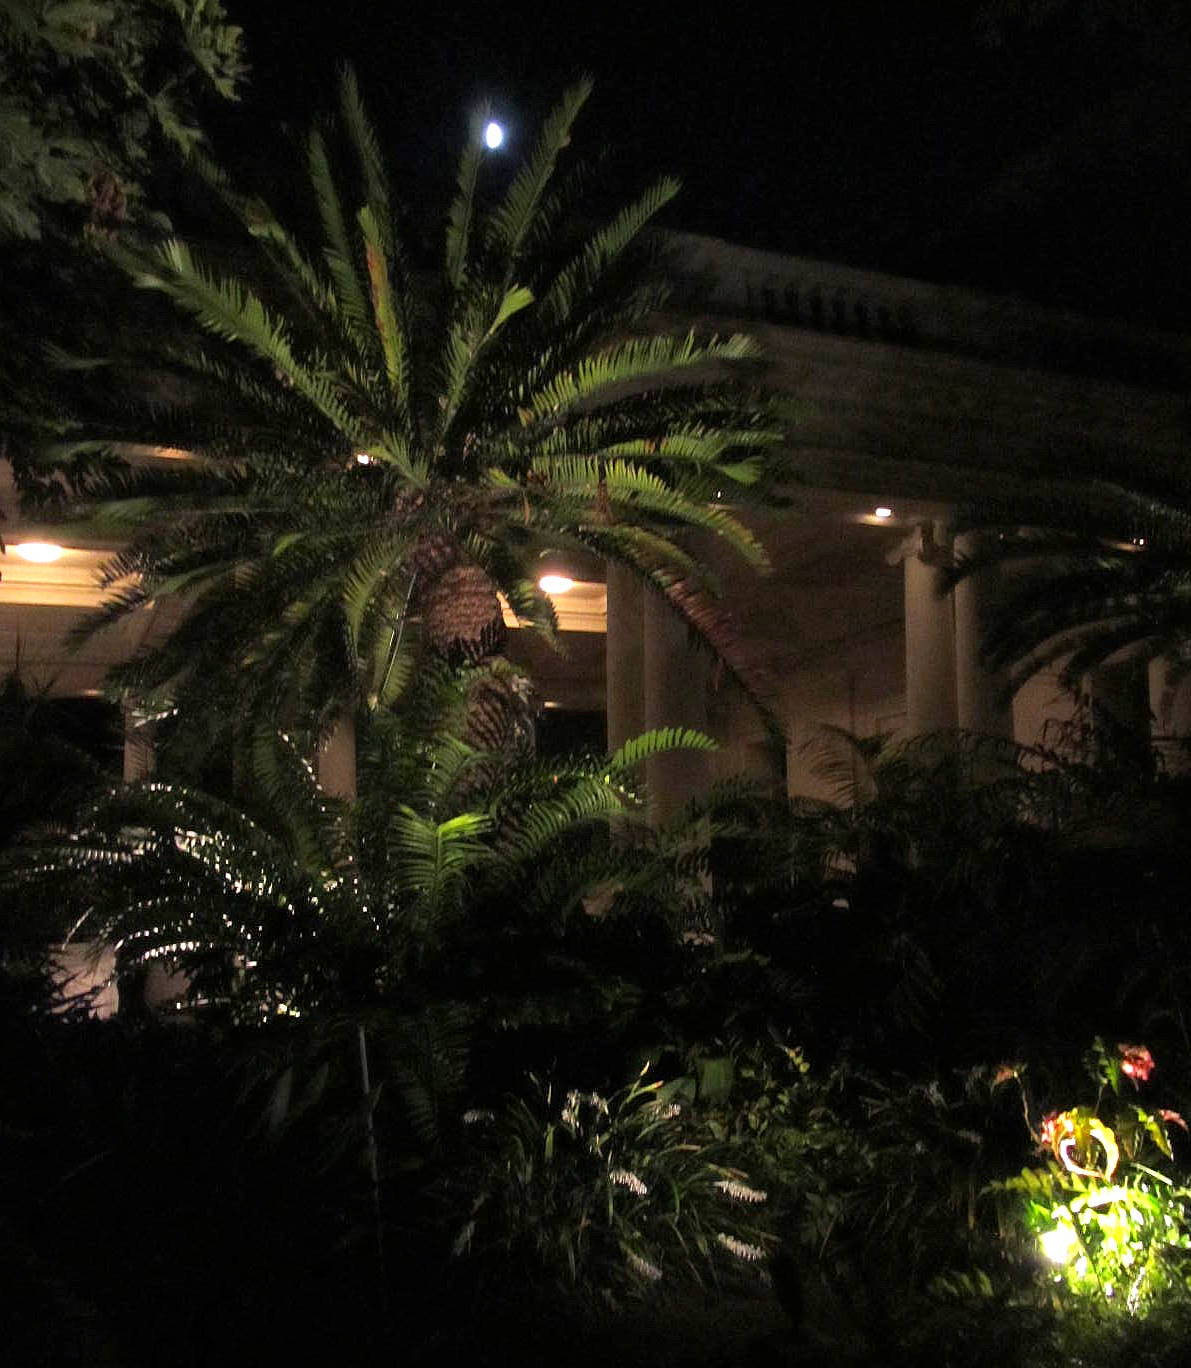 Fairy Yardmother Landscape Design: The Garden at Night ...